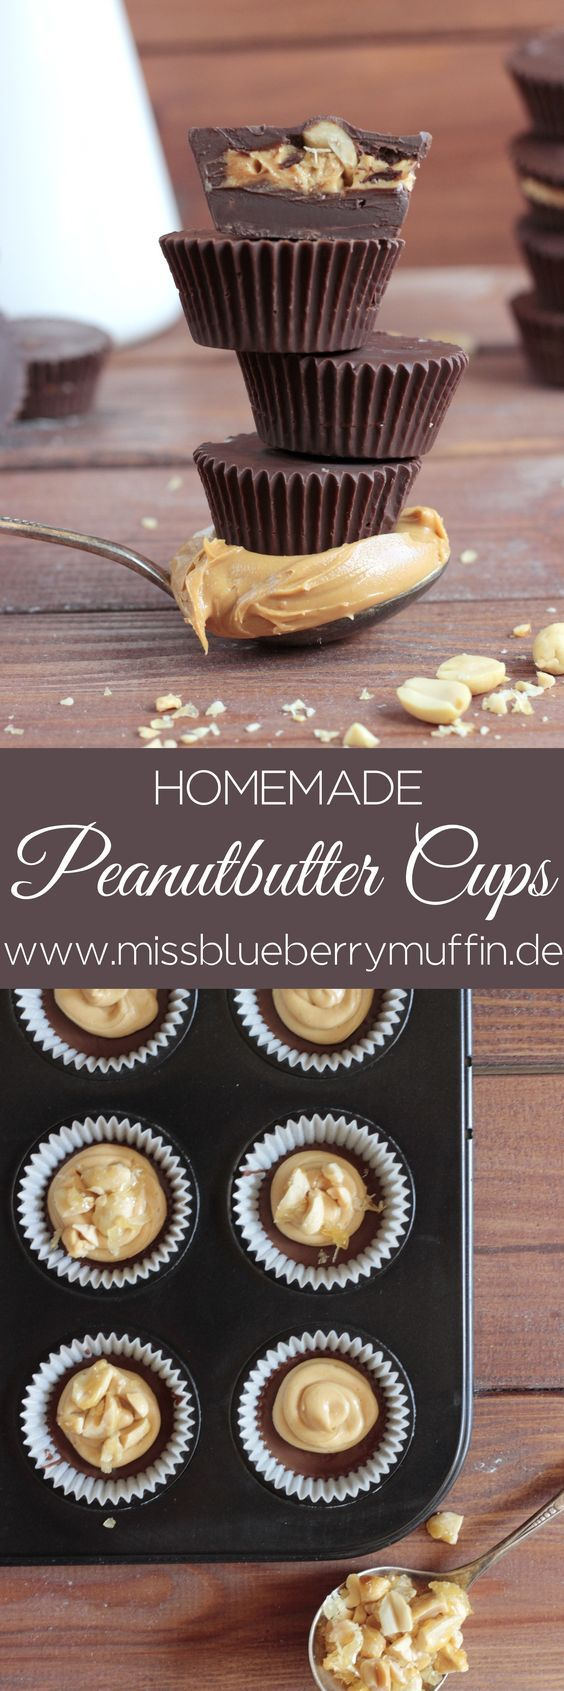 Peanutbutter Cups mit karamellisierten Erdnüssen selber machen // Homemade Peanutbutter Cups with caramelized peanuts <3